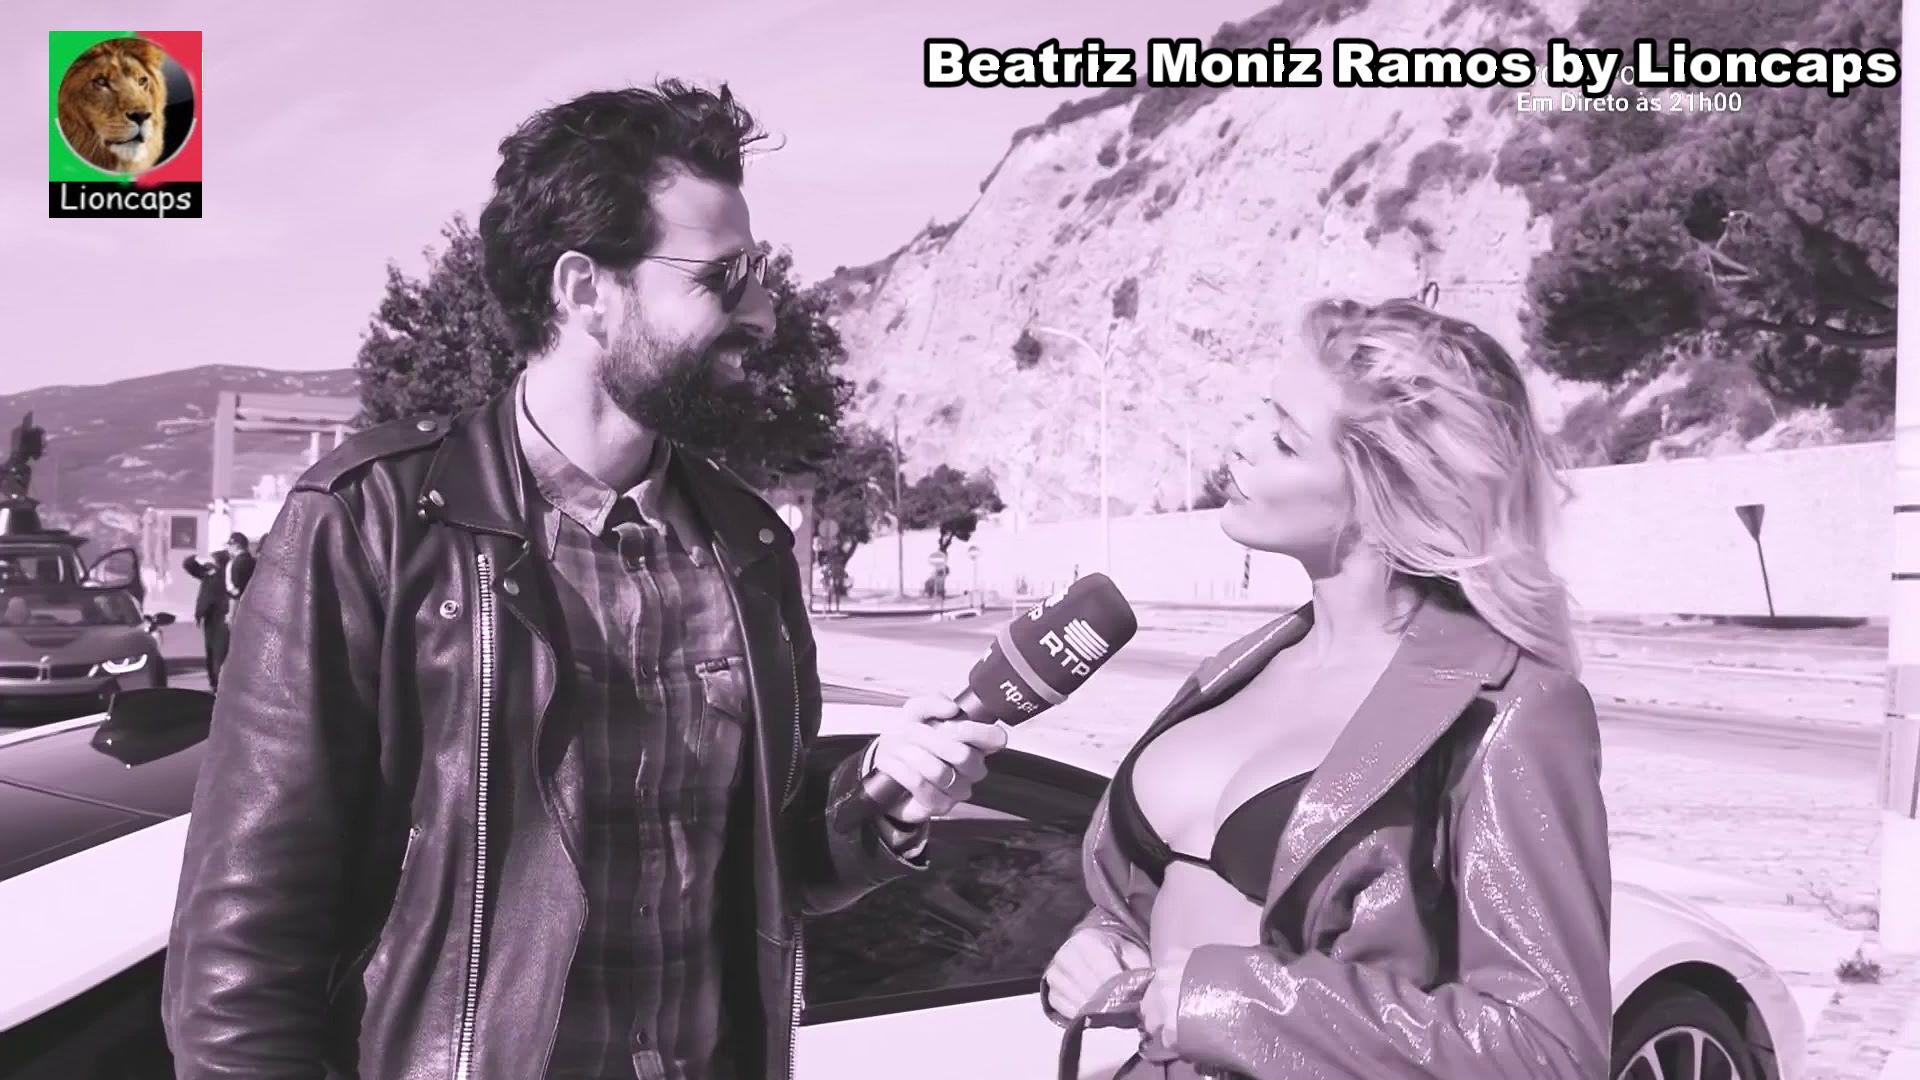 205986603_beatriz_moniz_ramos_vs191224_1349_122_429lo.JPG